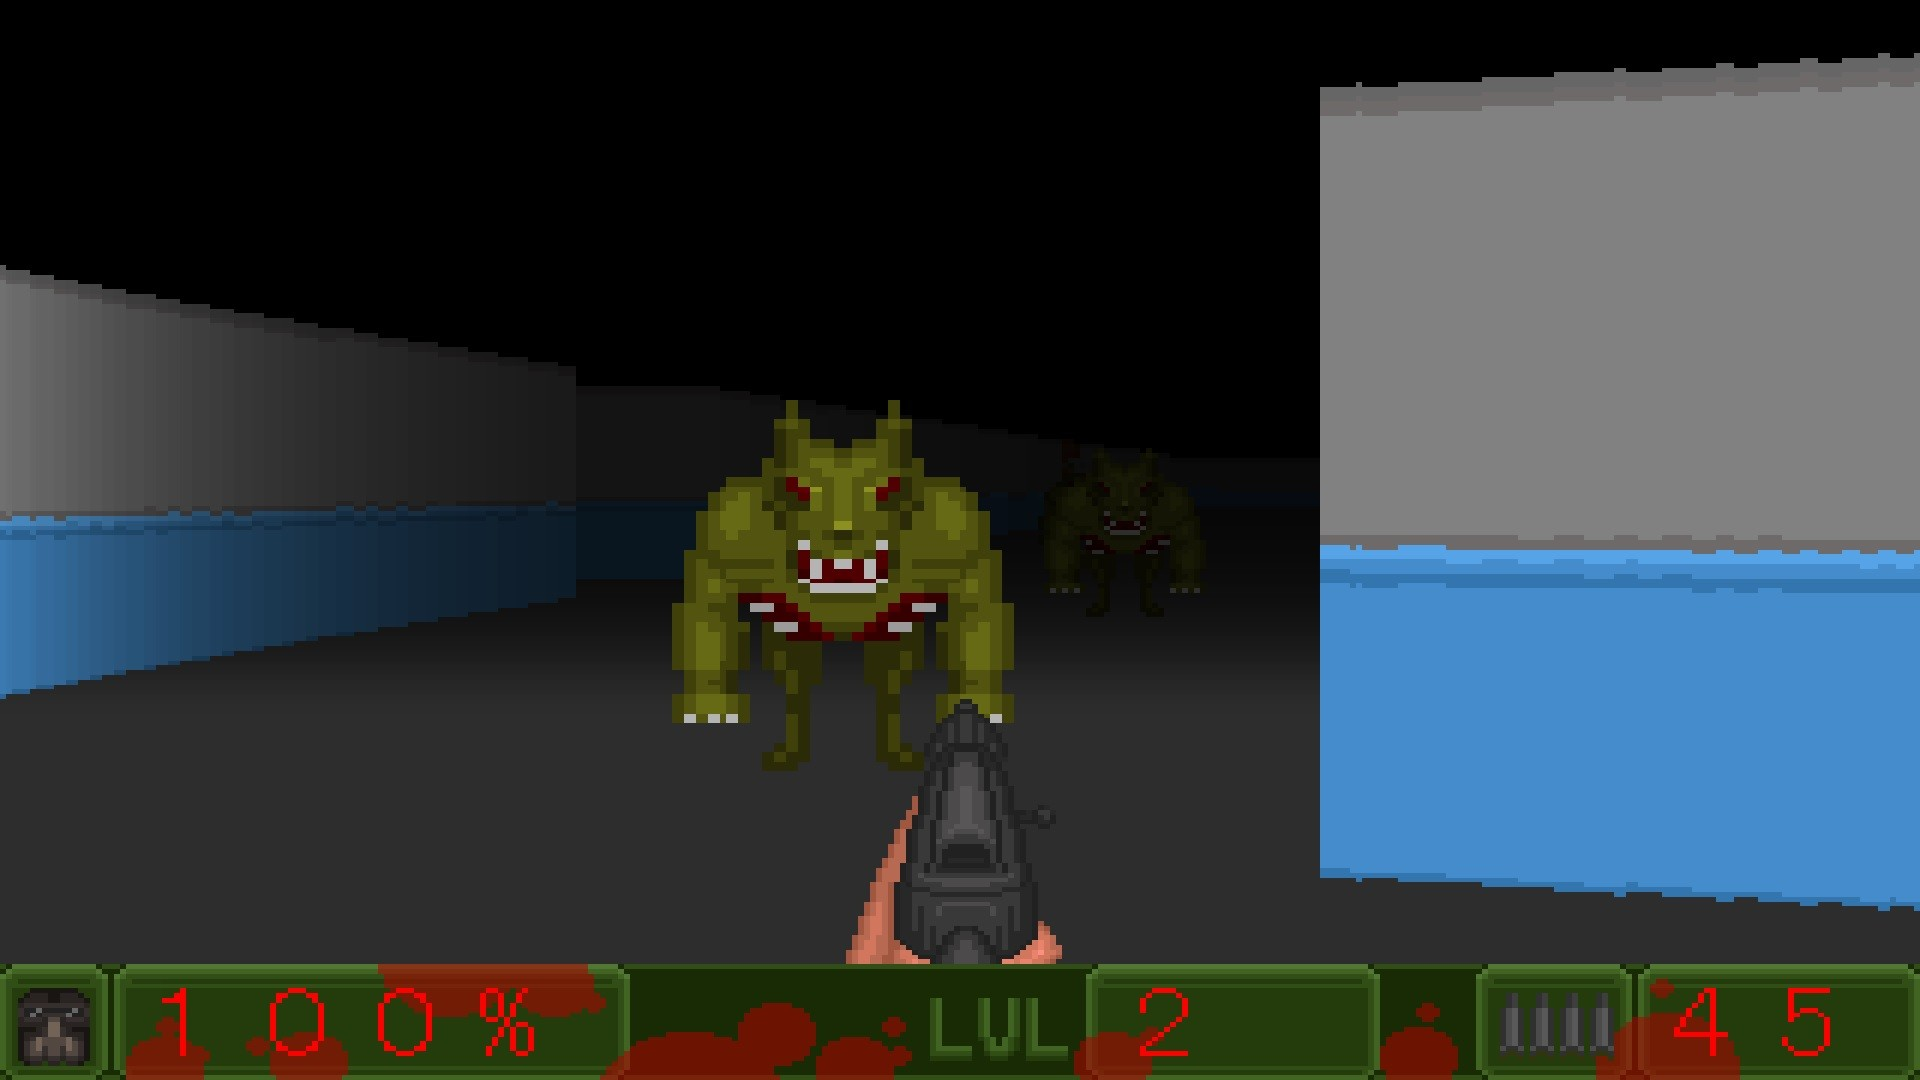 Z.O.M.B.I.E. screenshot